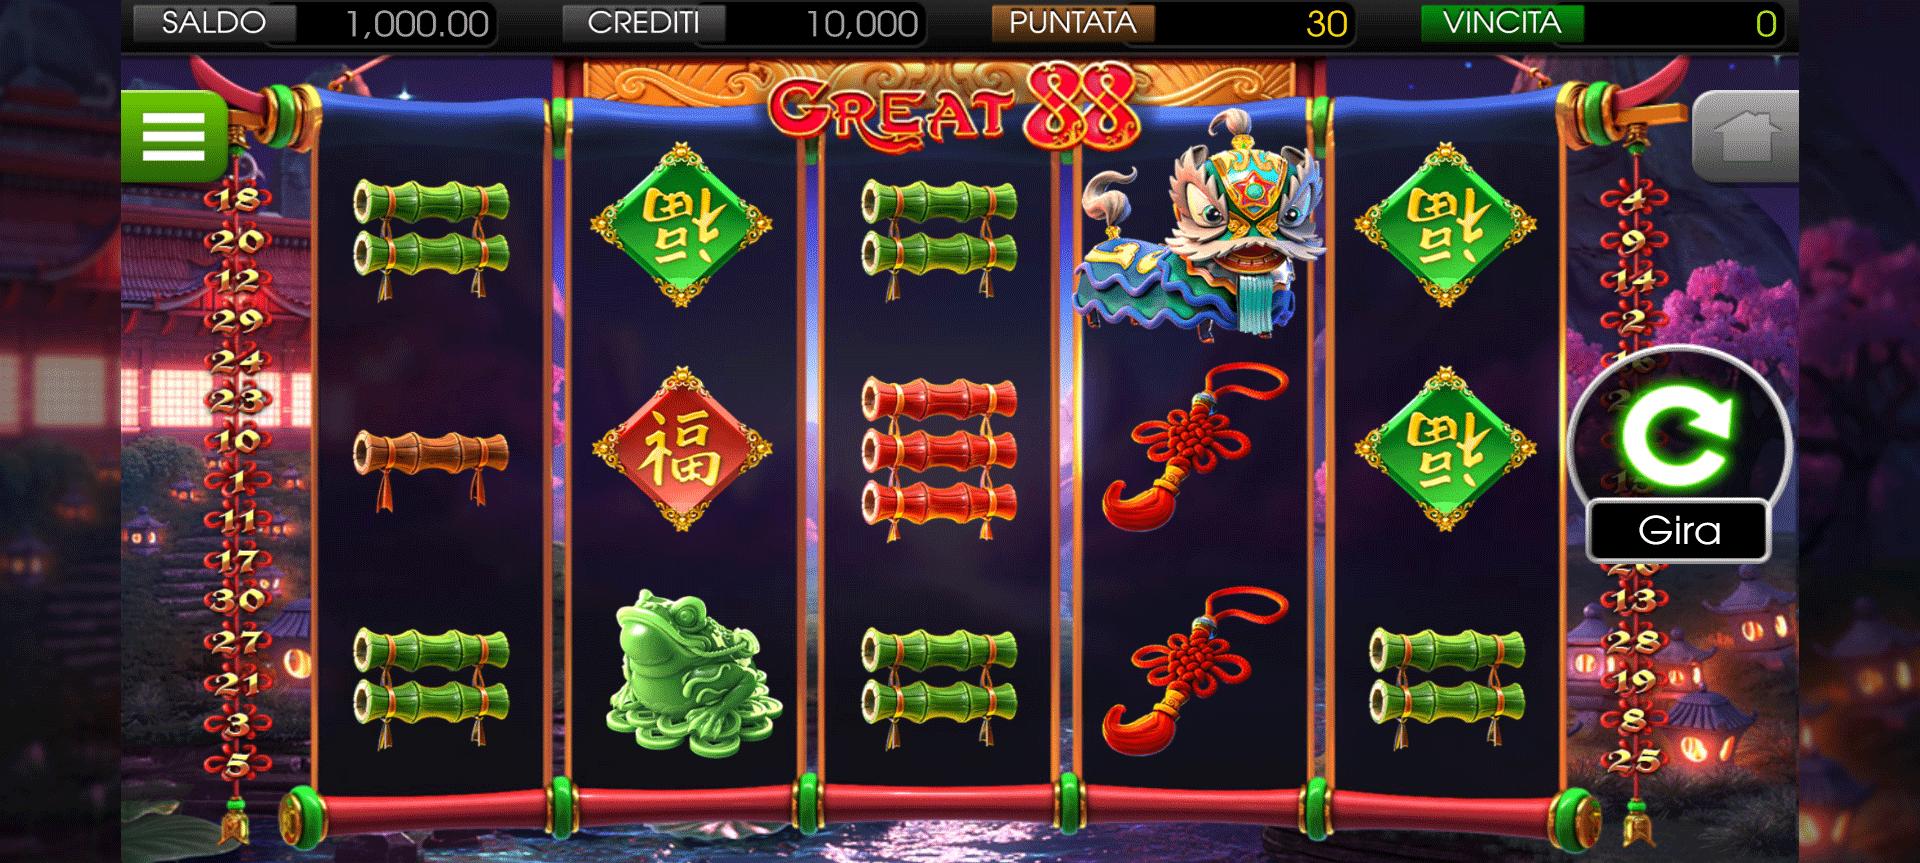 Slot Great 88